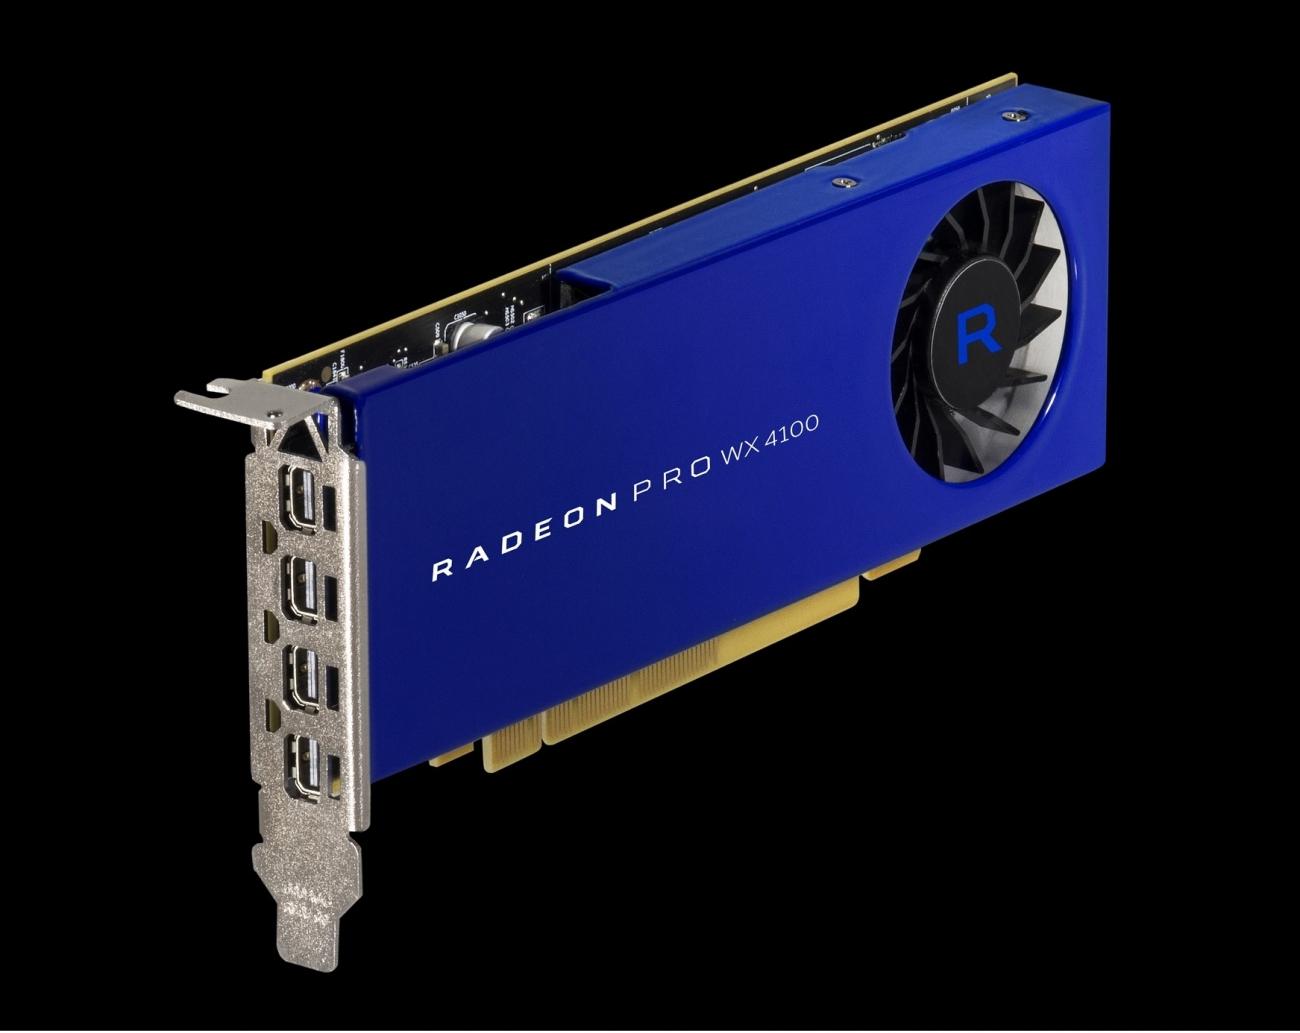 amd-radeon-pro-wx-4100-graphics-card